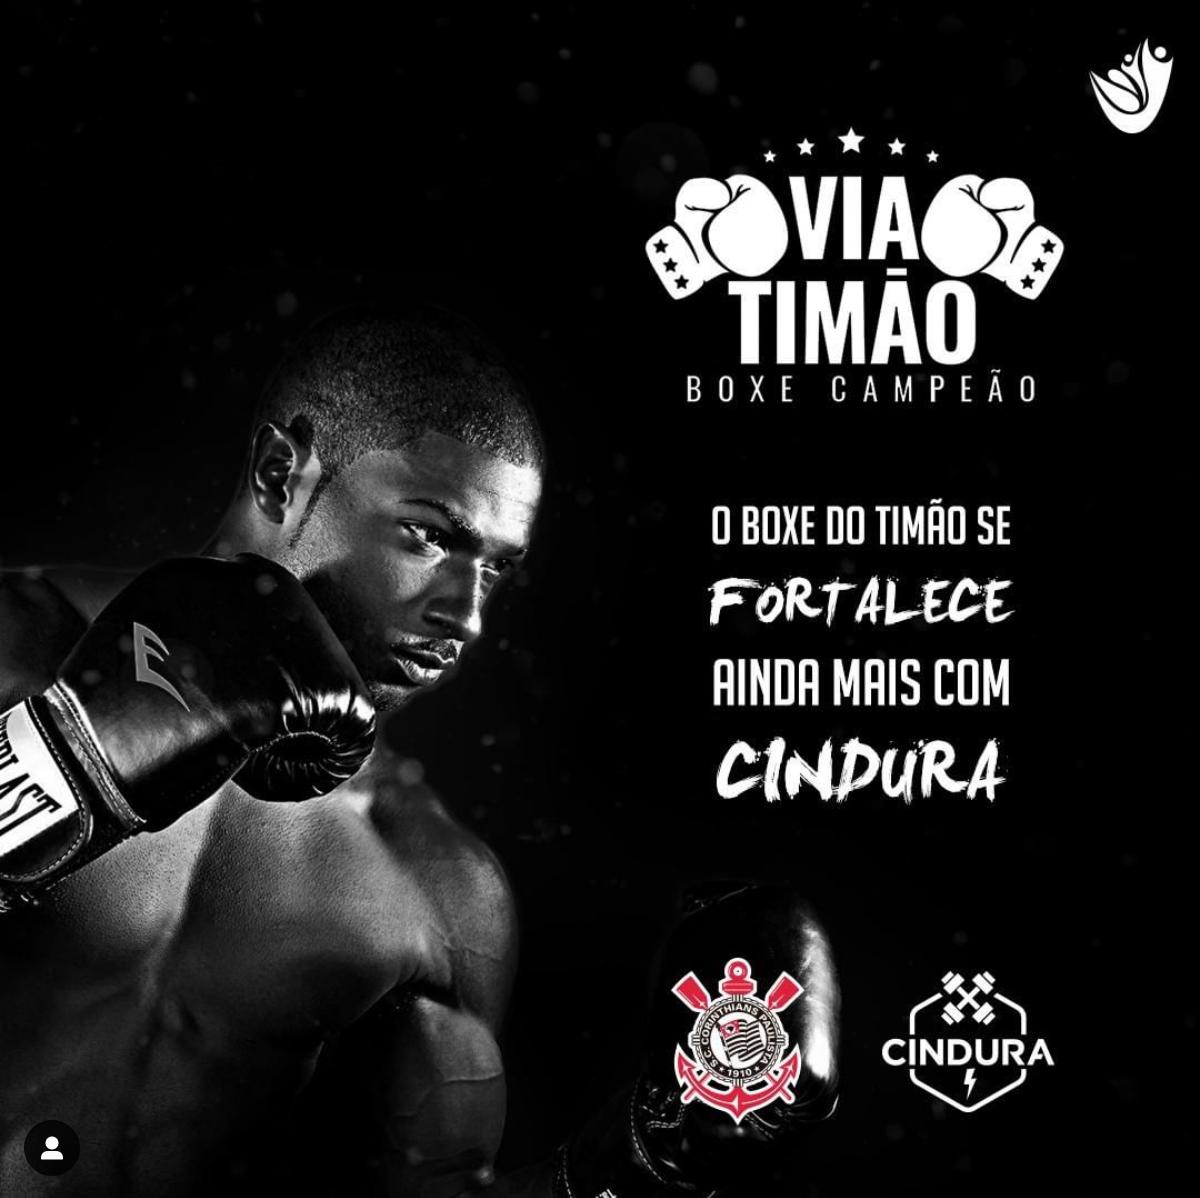 Cindura-Corinthians-6